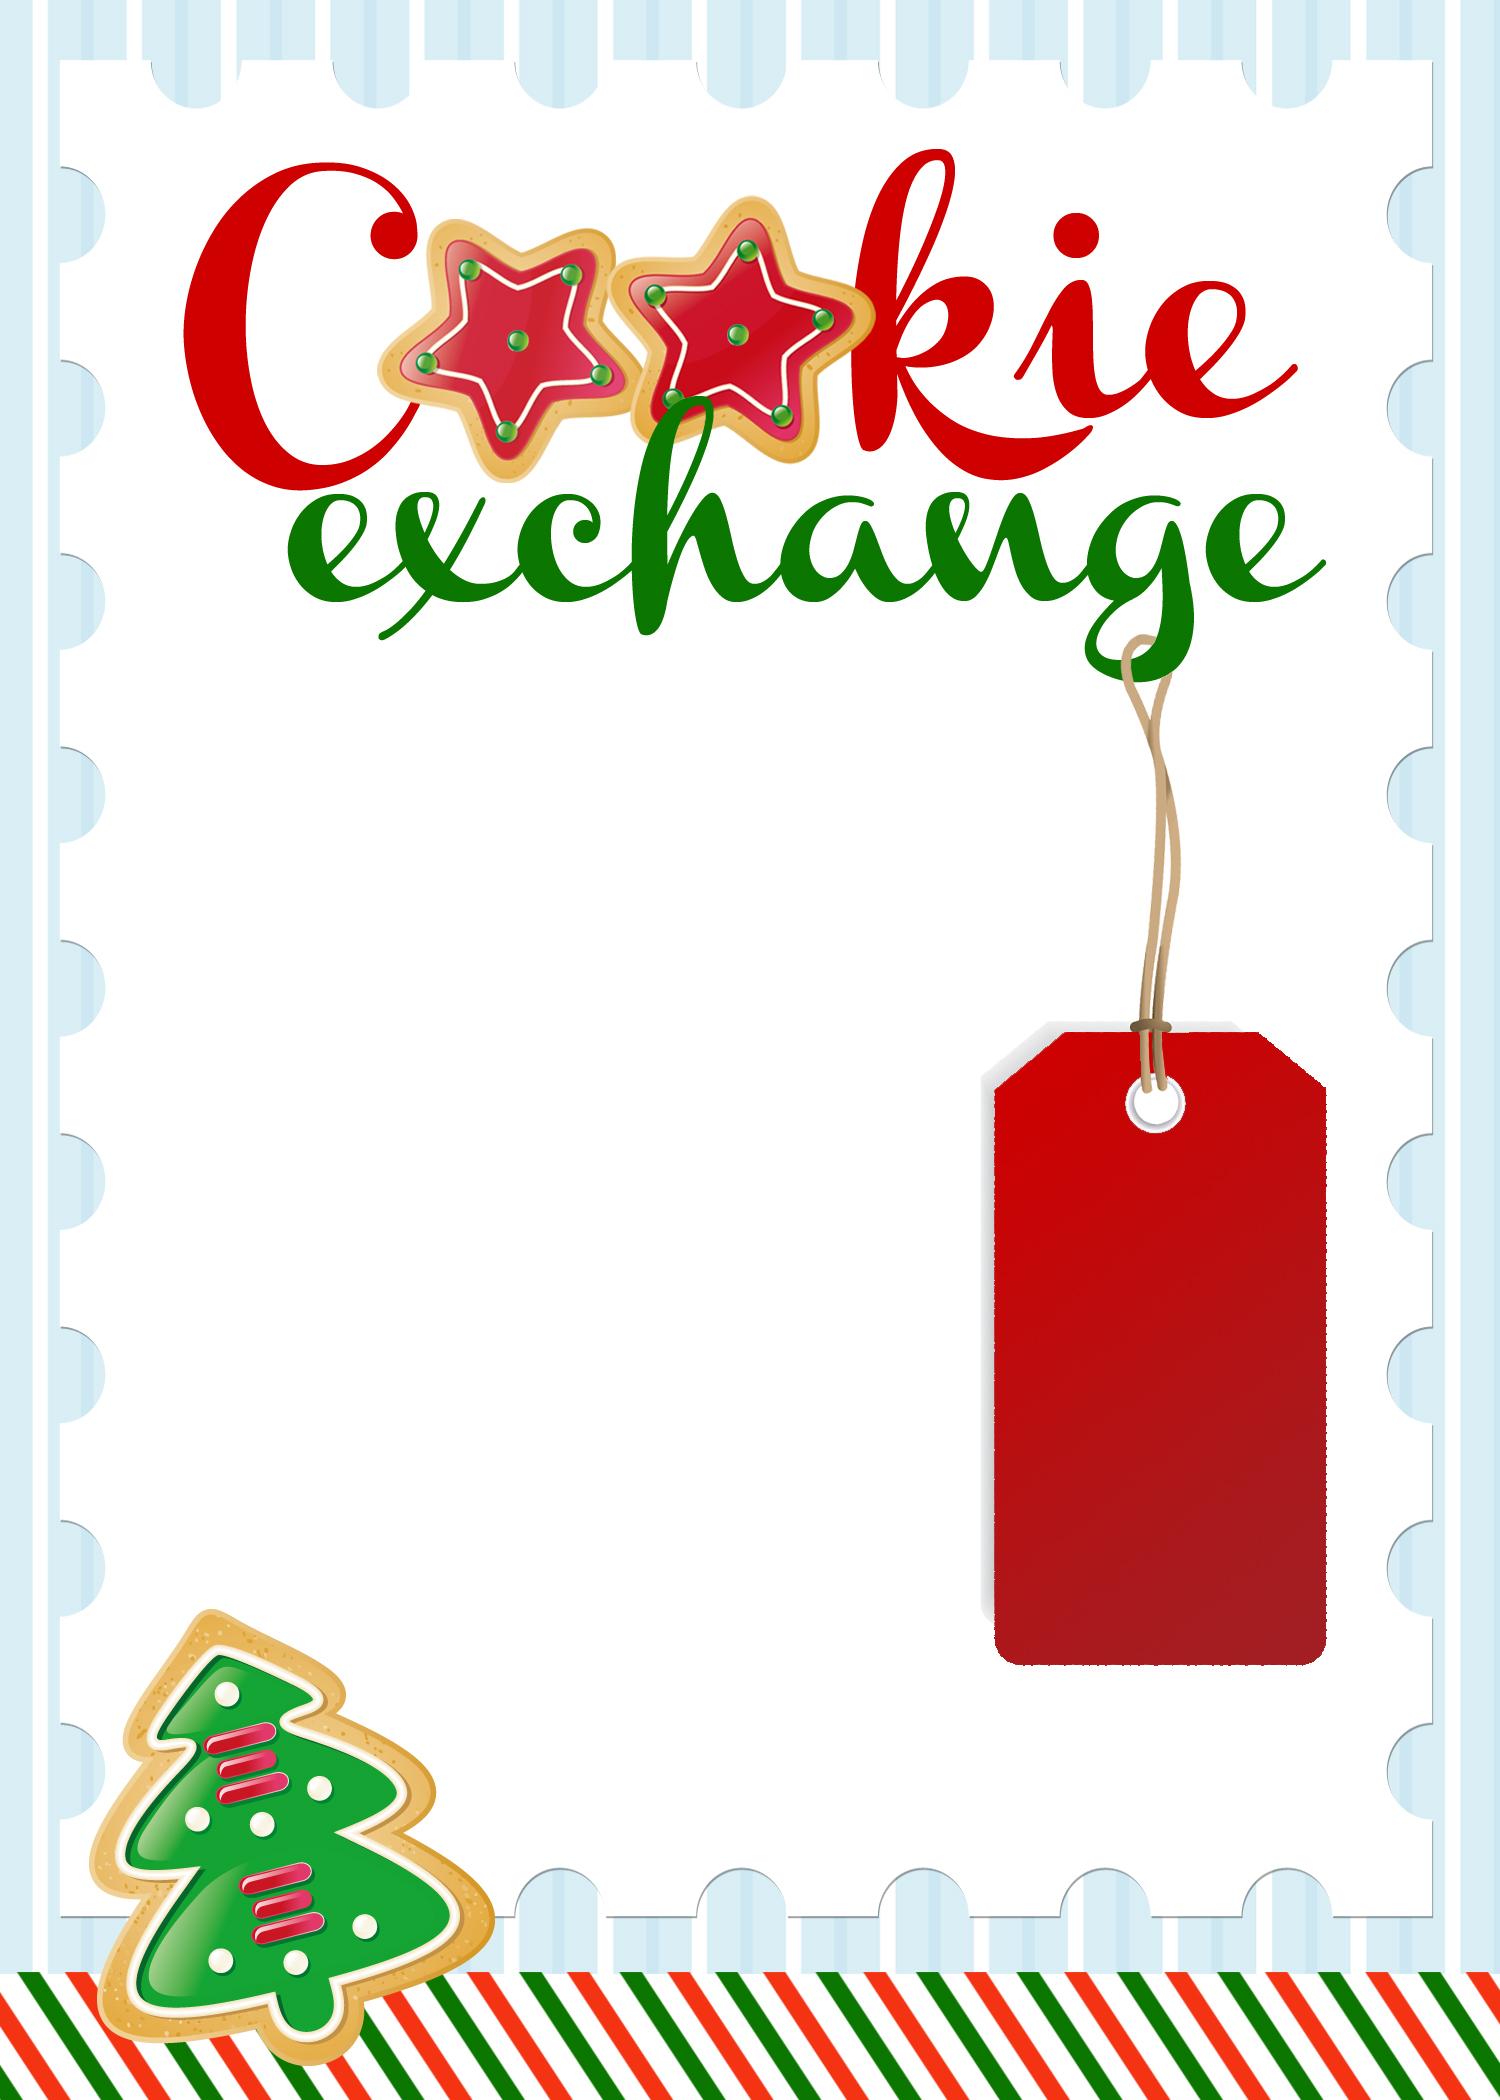 Christmas Cookie Exchange Invitations Templates